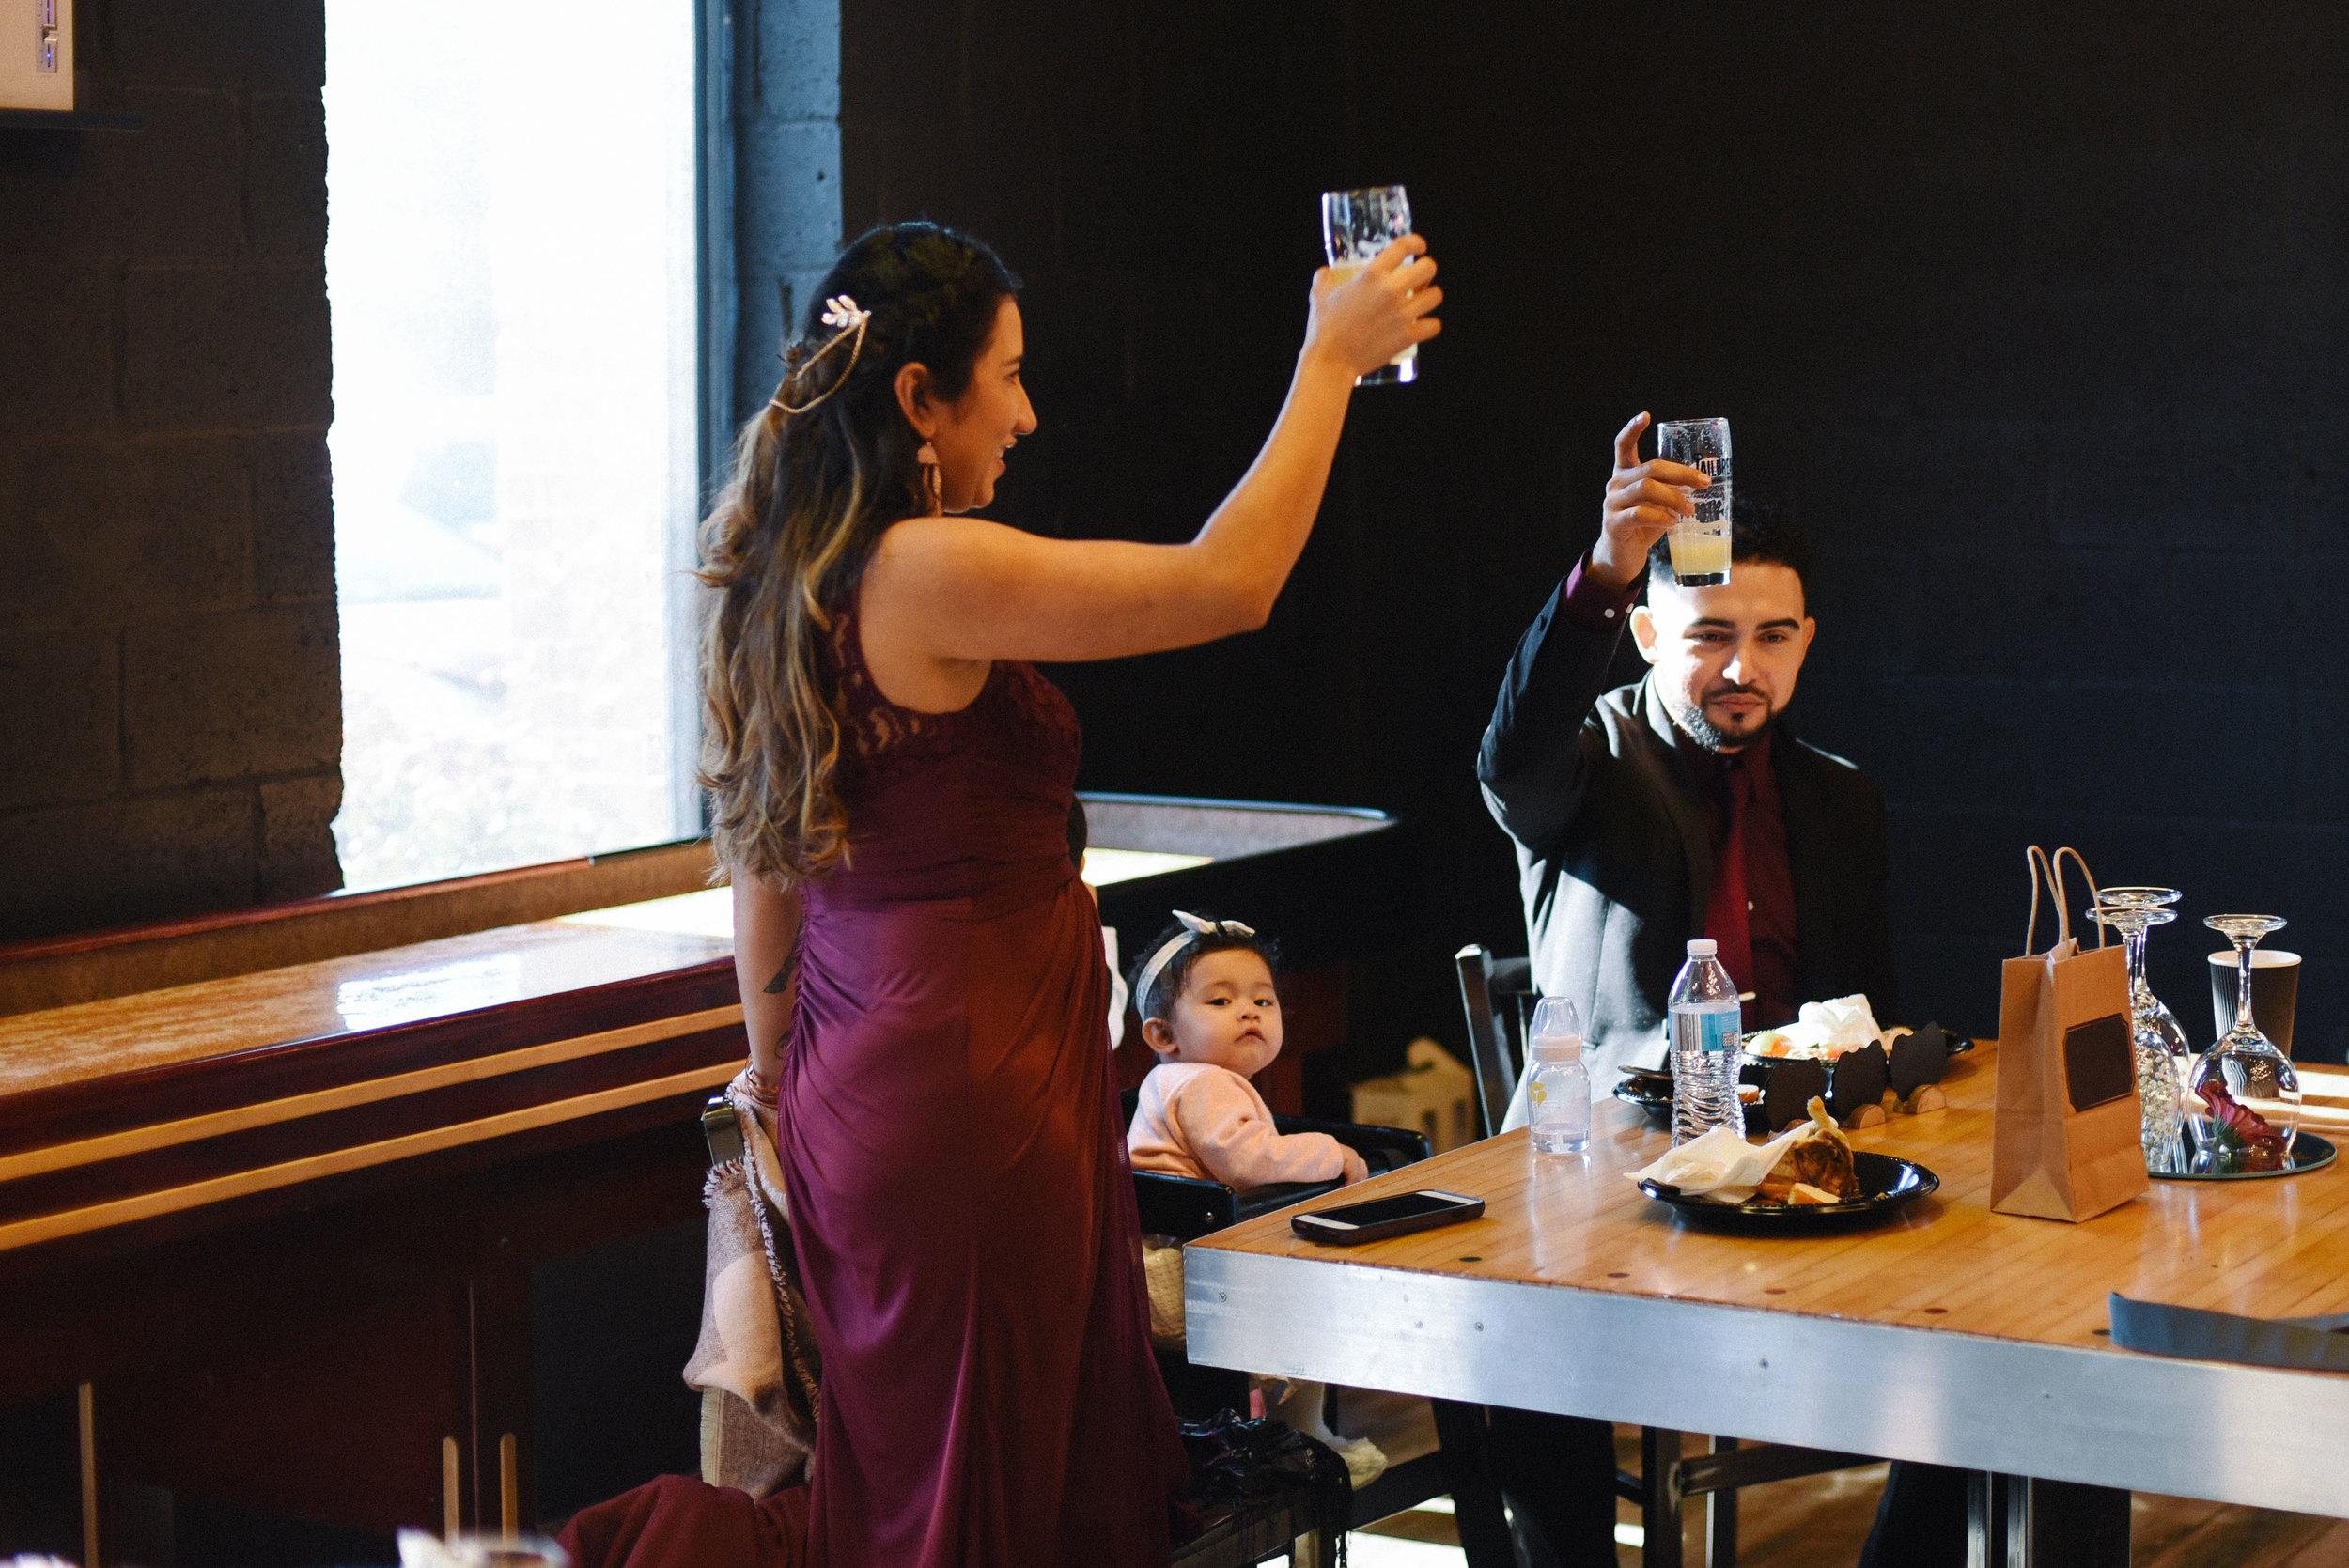 maryland_wedding_photographer_jailbreak_brewing_company-79.jpg